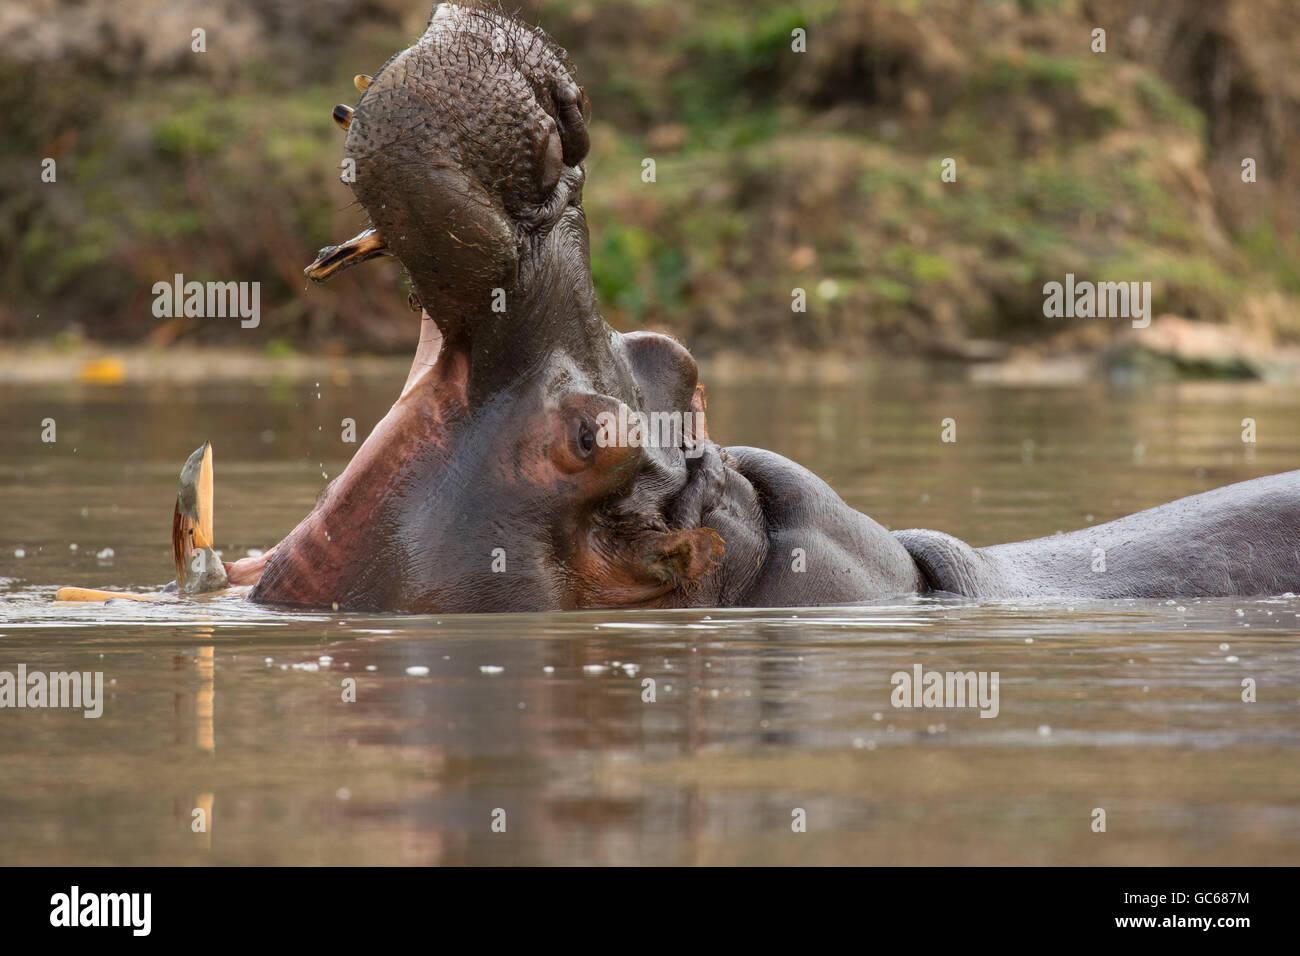 Hippopotame (Hippopotamus amphibius), Safari de faune, Winston, Oregon Photo Stock